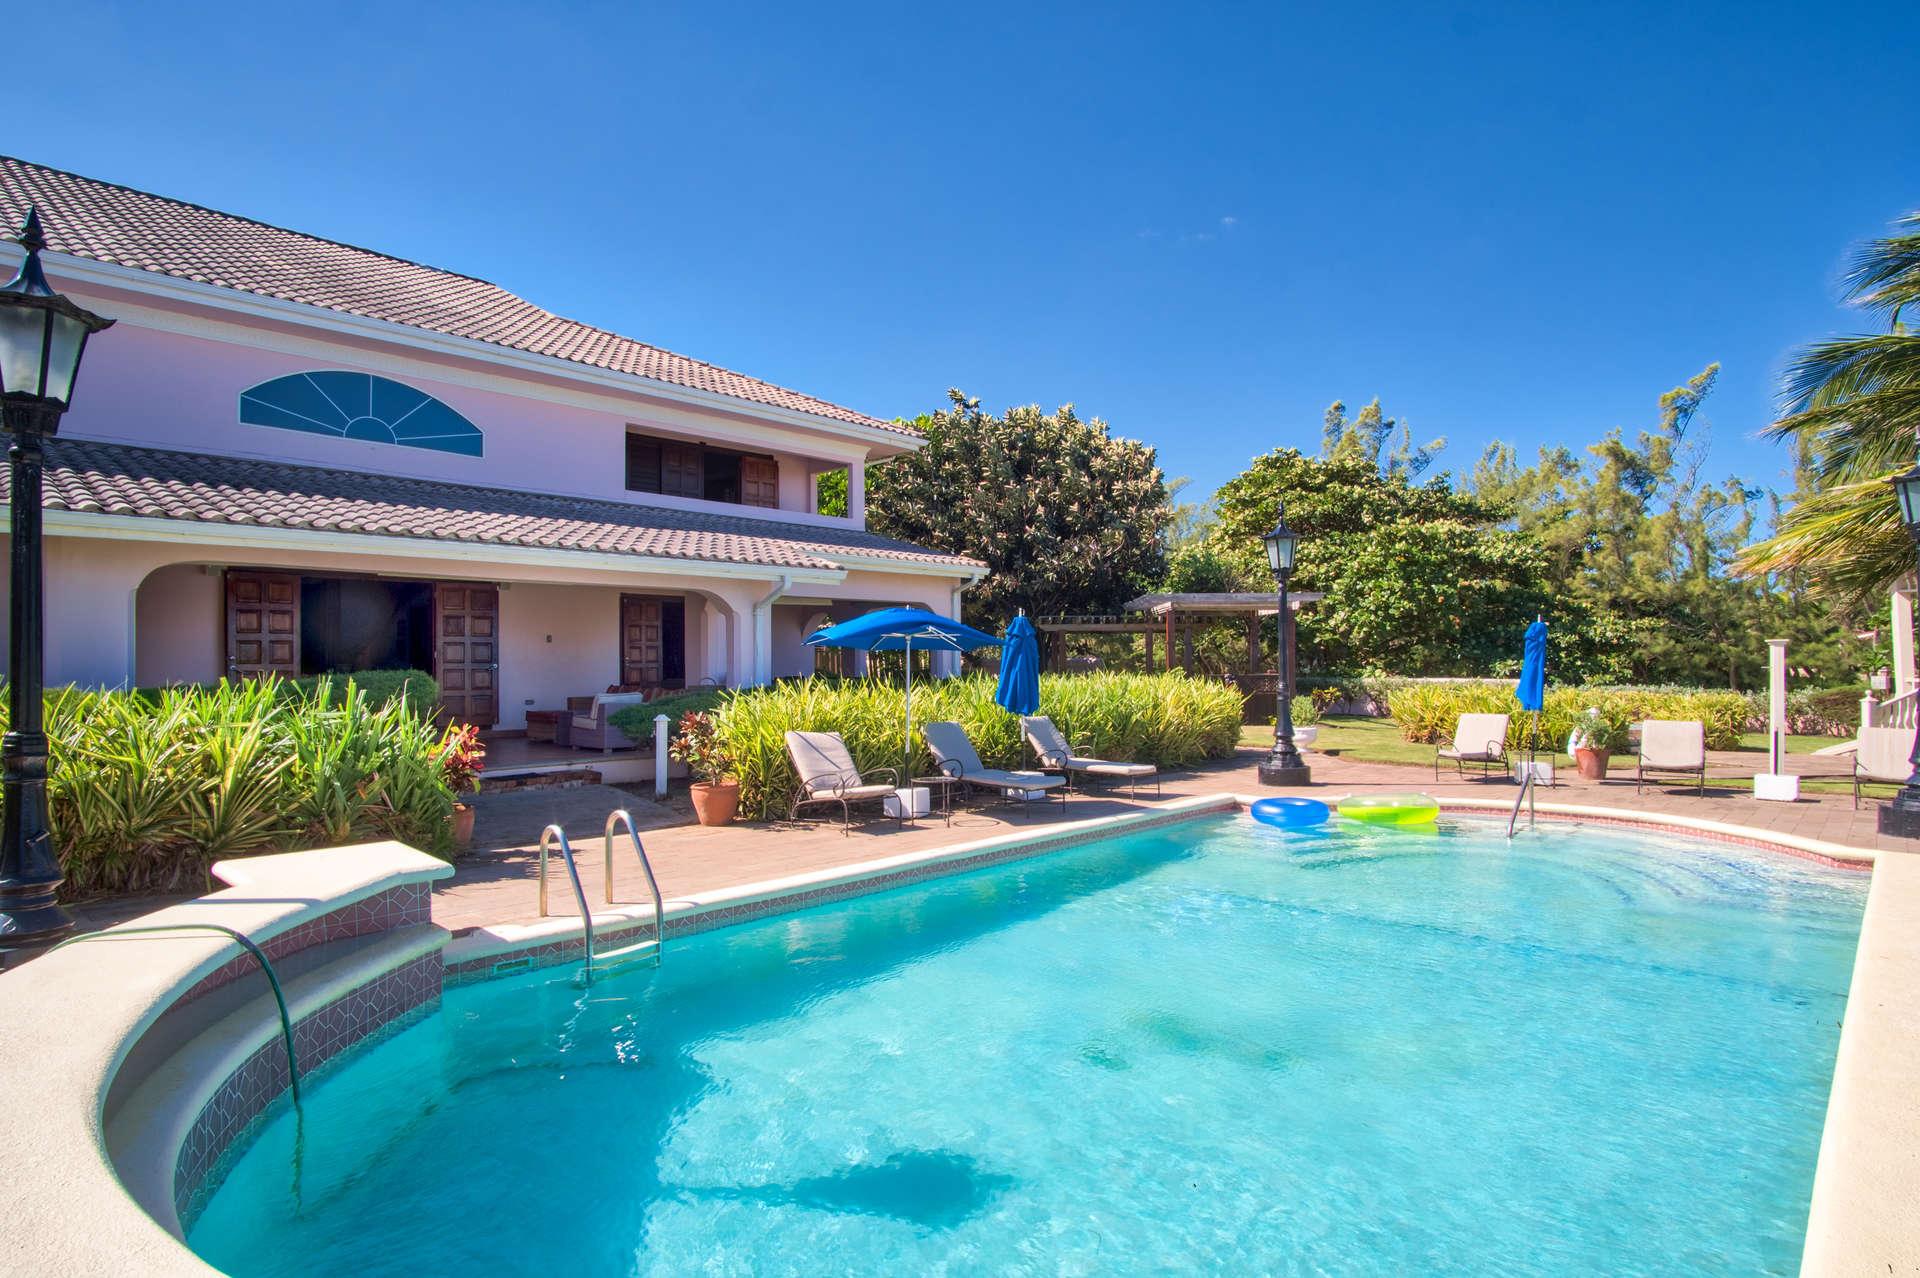 Luxury villa rentals caribbean - Jamaica - Ocho rios - Villa Paradiso | Mammee Bay Estate - Image 1/23